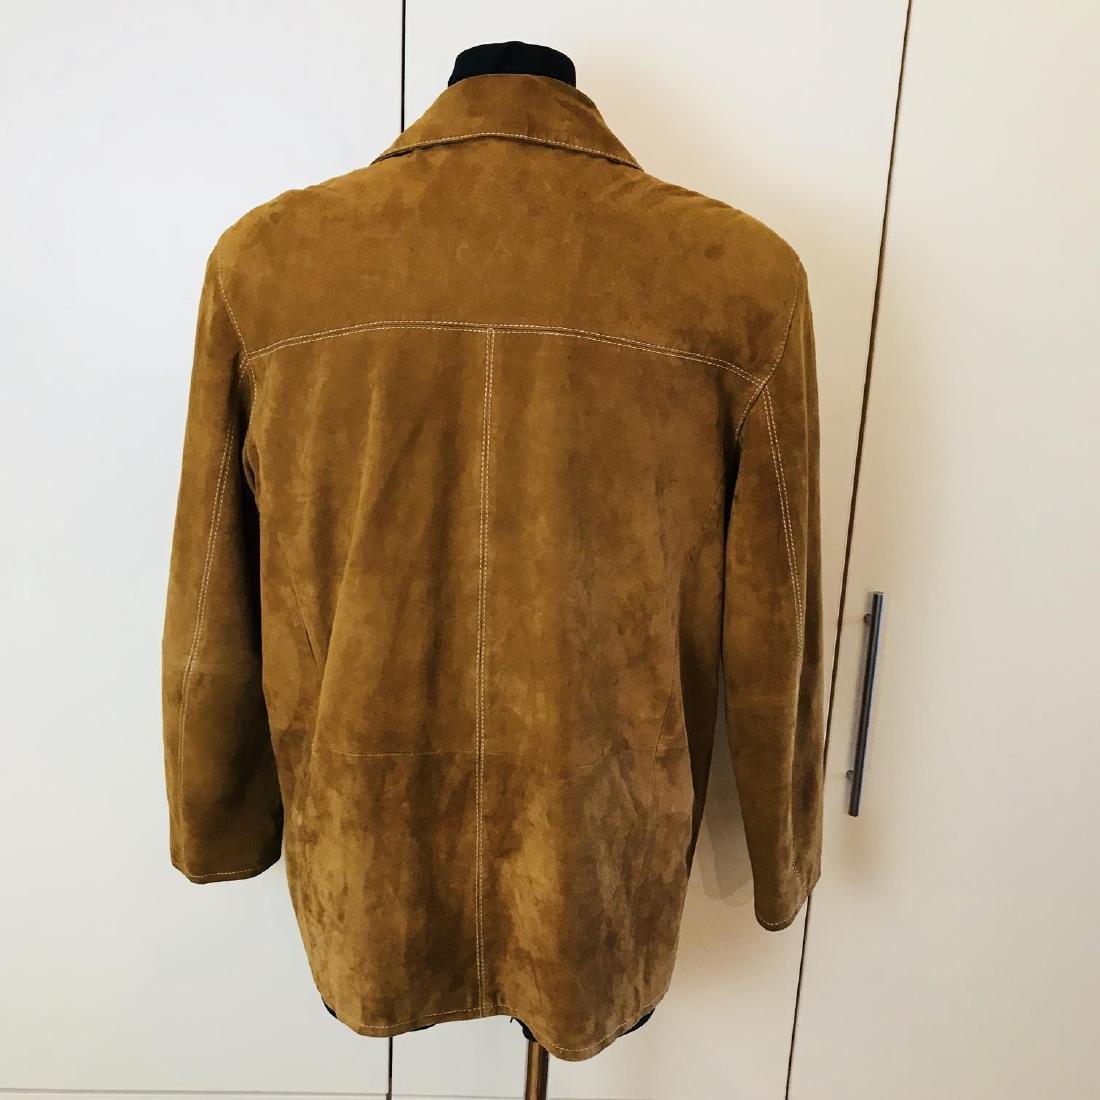 Vintage Men's Brown Suede Leather Jacket Coat Size 40 - 5